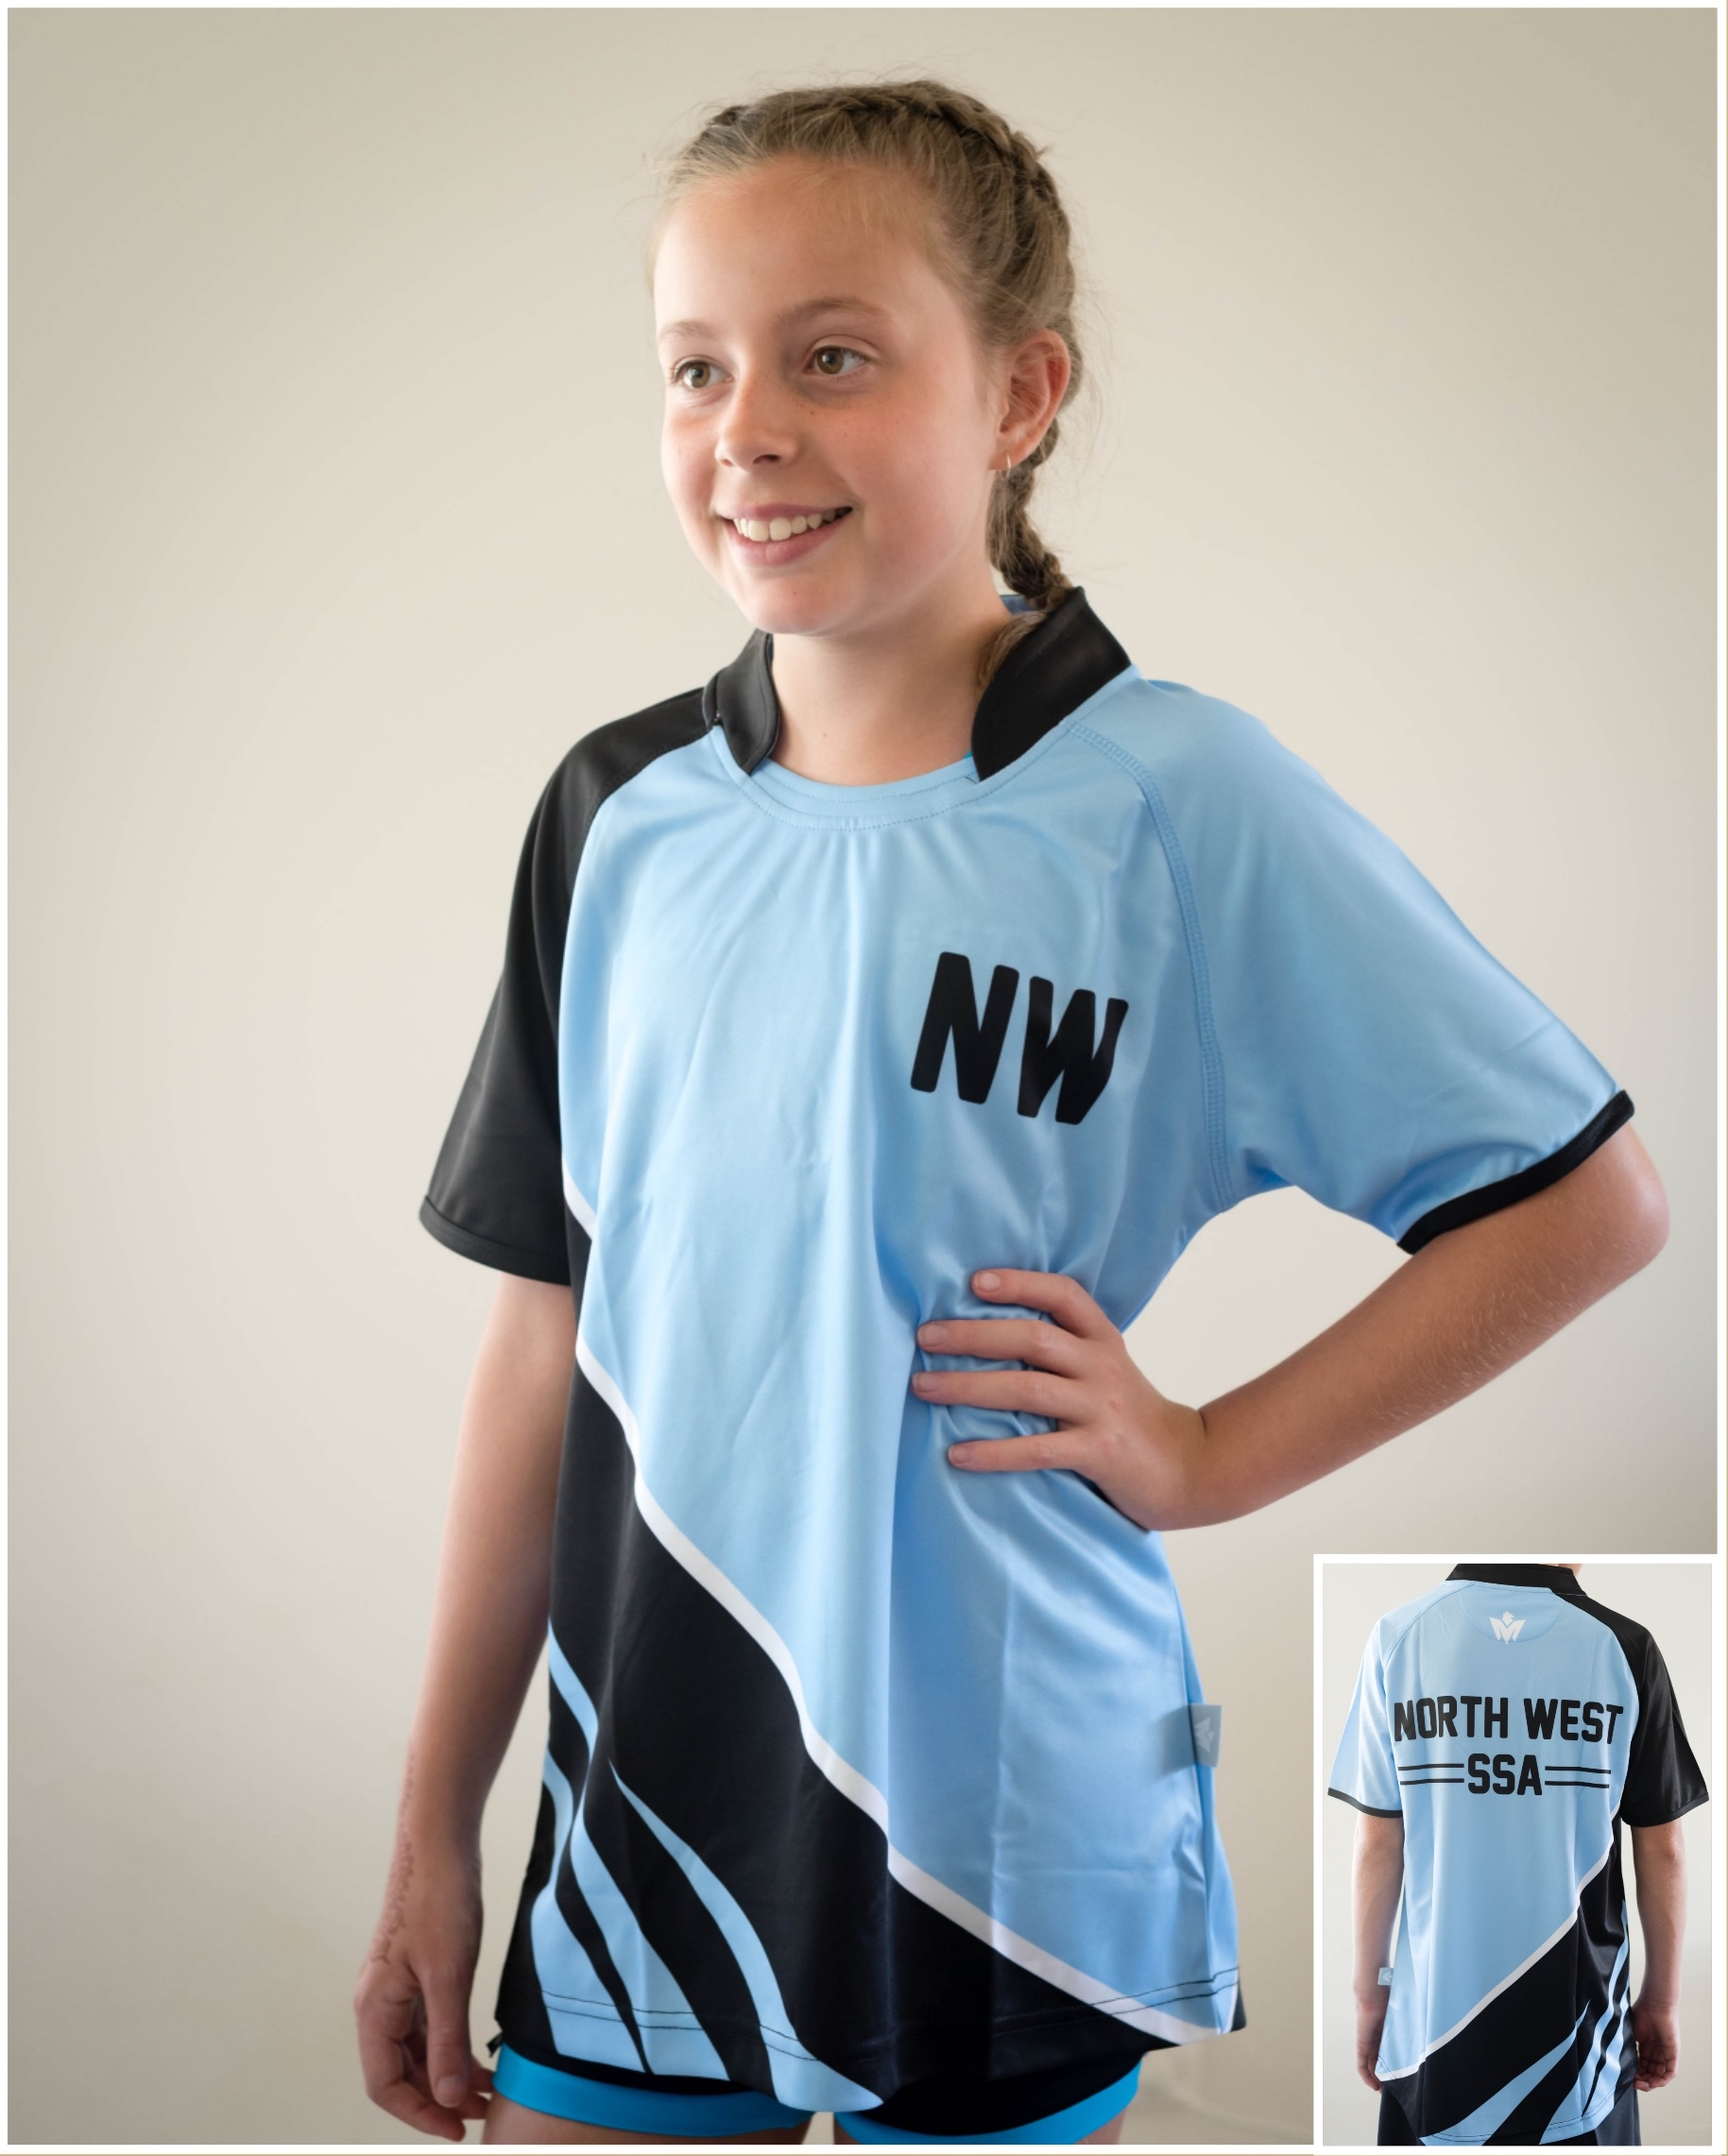 NW G sports shirt